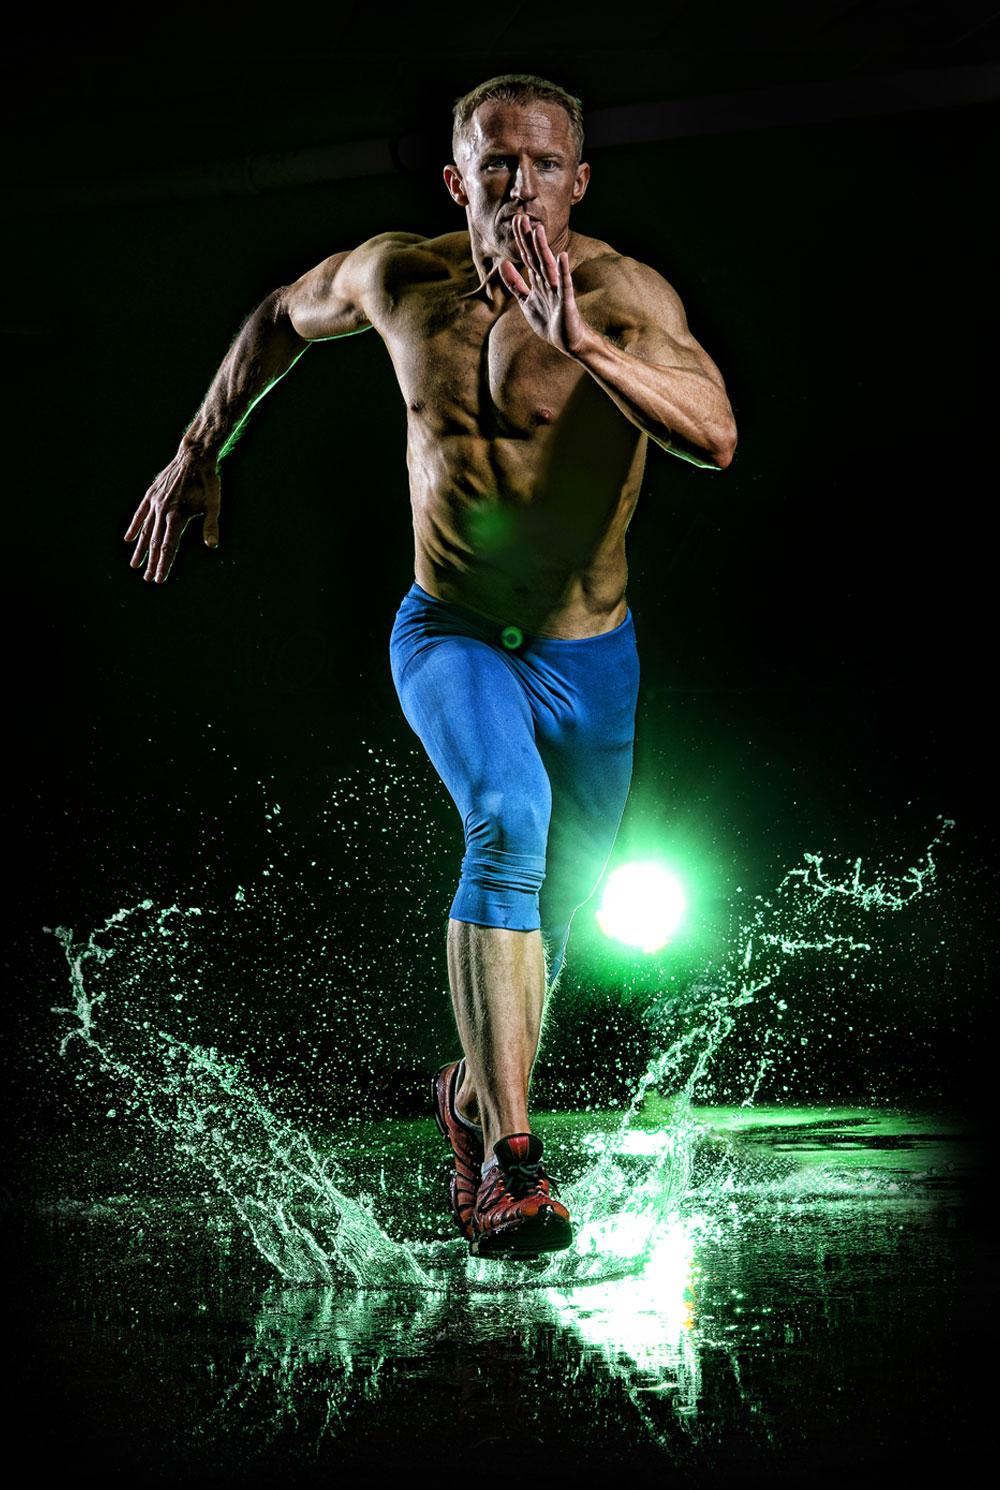 Fitness-Photography-Brandon-Barnard-Photography-running-in-water.jpg